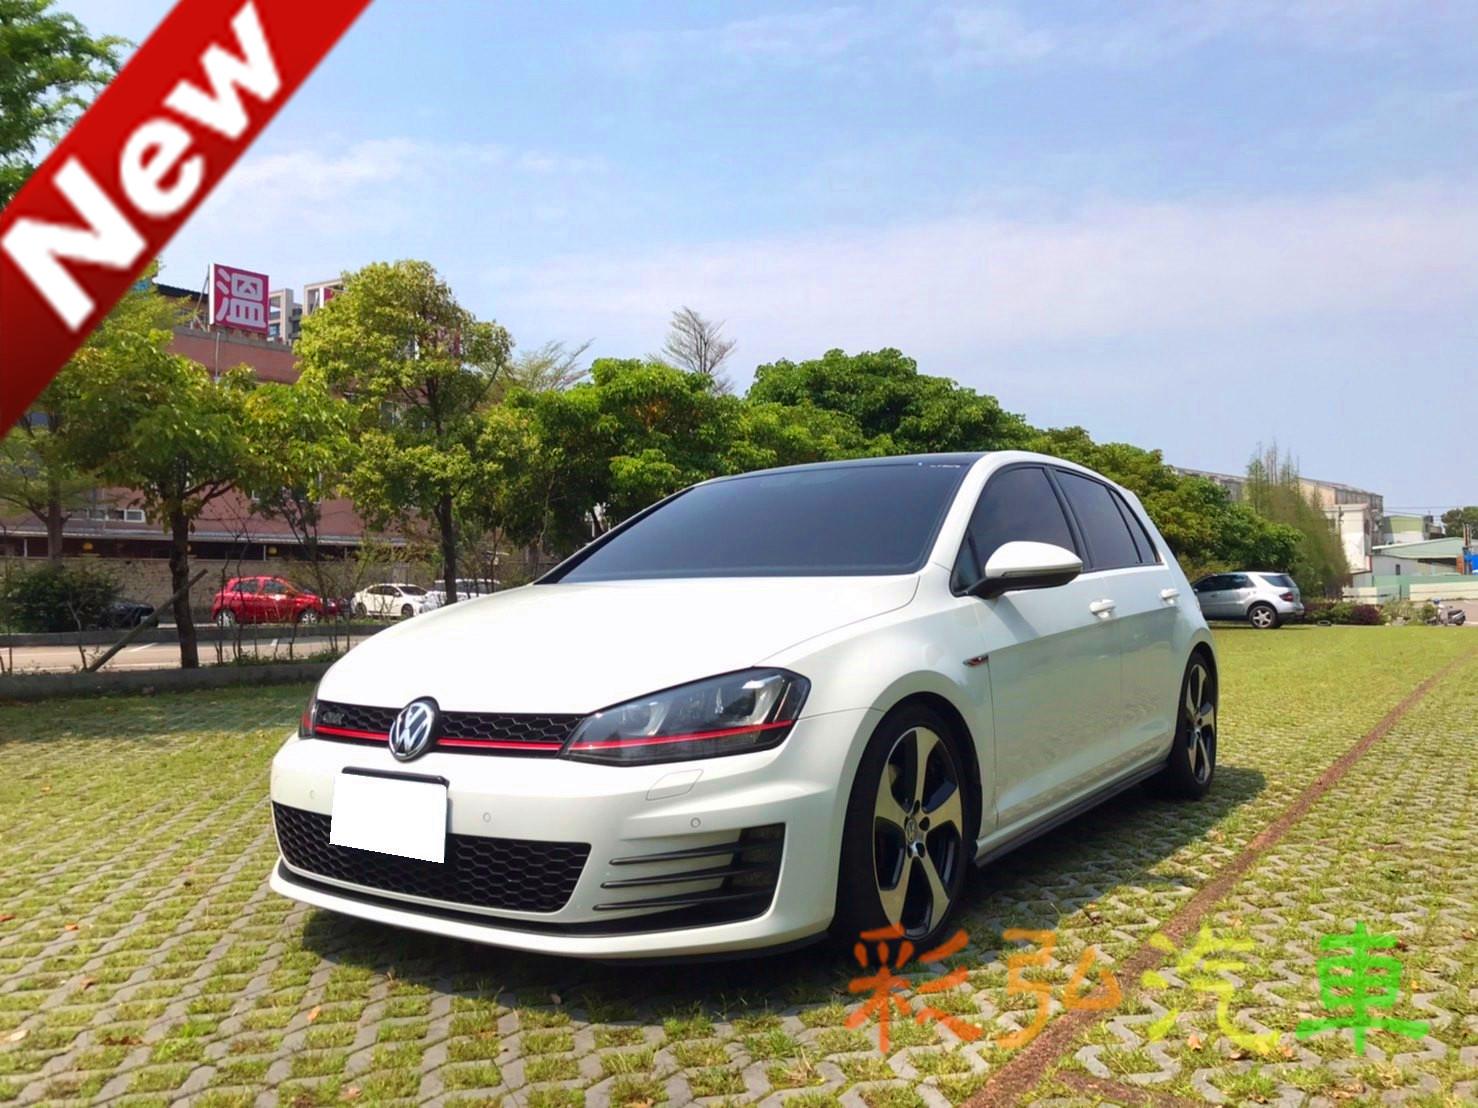 2015 Volkswagen 福斯 Golf gti